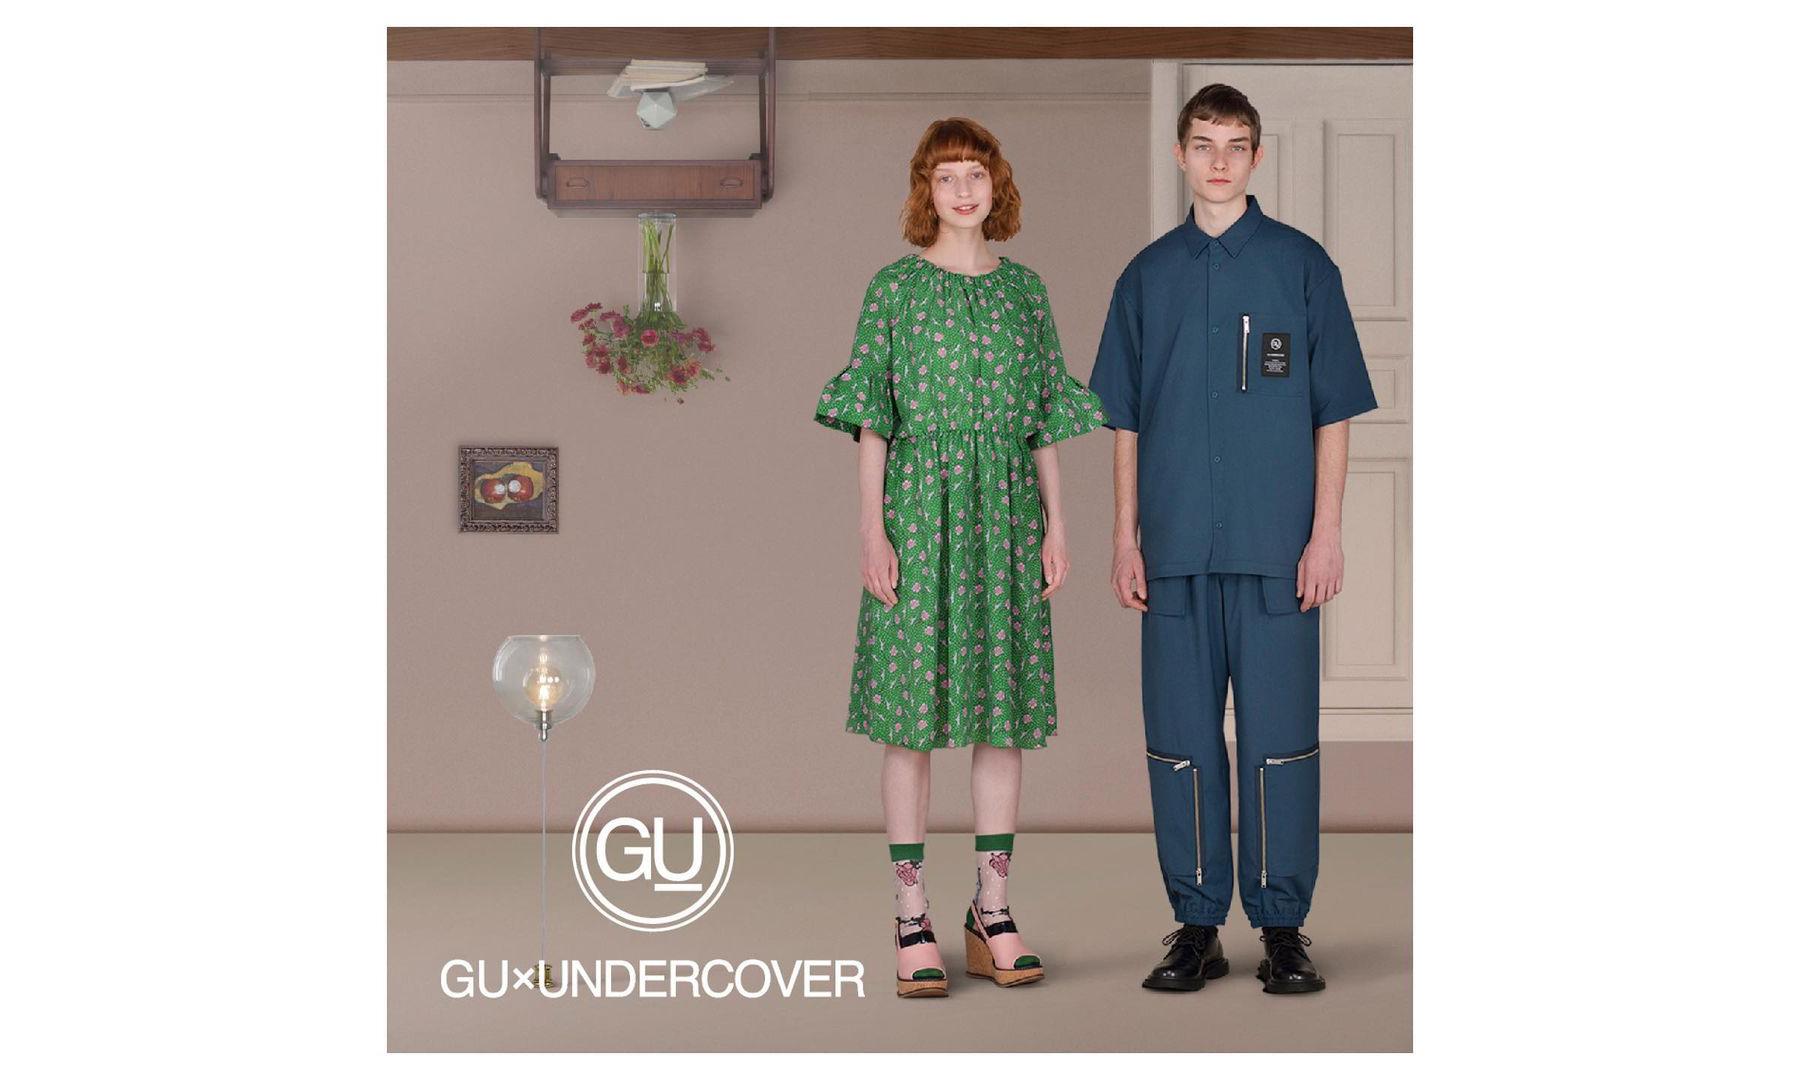 UNDERCOVER x GU 联名系列释出